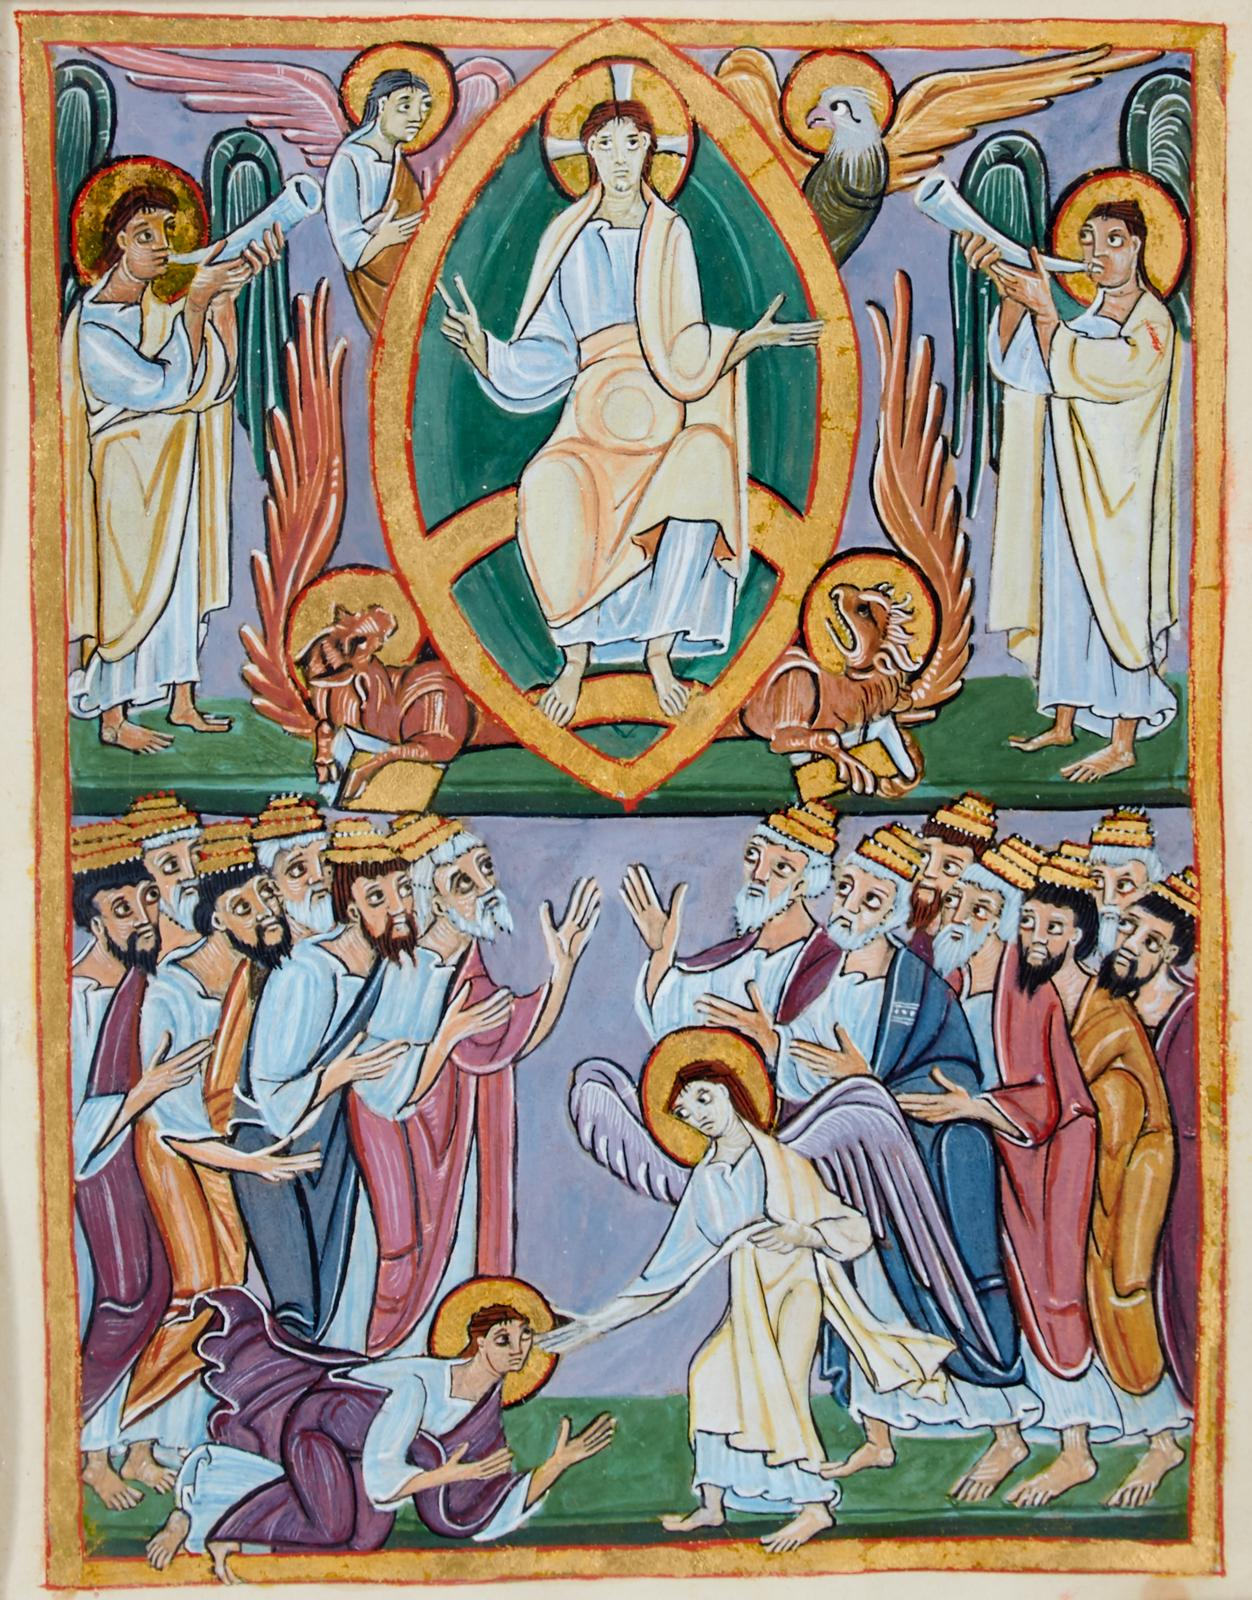 Apocalypse de Bamberg 1000 ca Apocalypse 19,1-9 fol 47v Bamberg, Staatsbibliothek, MS A. II. 42d